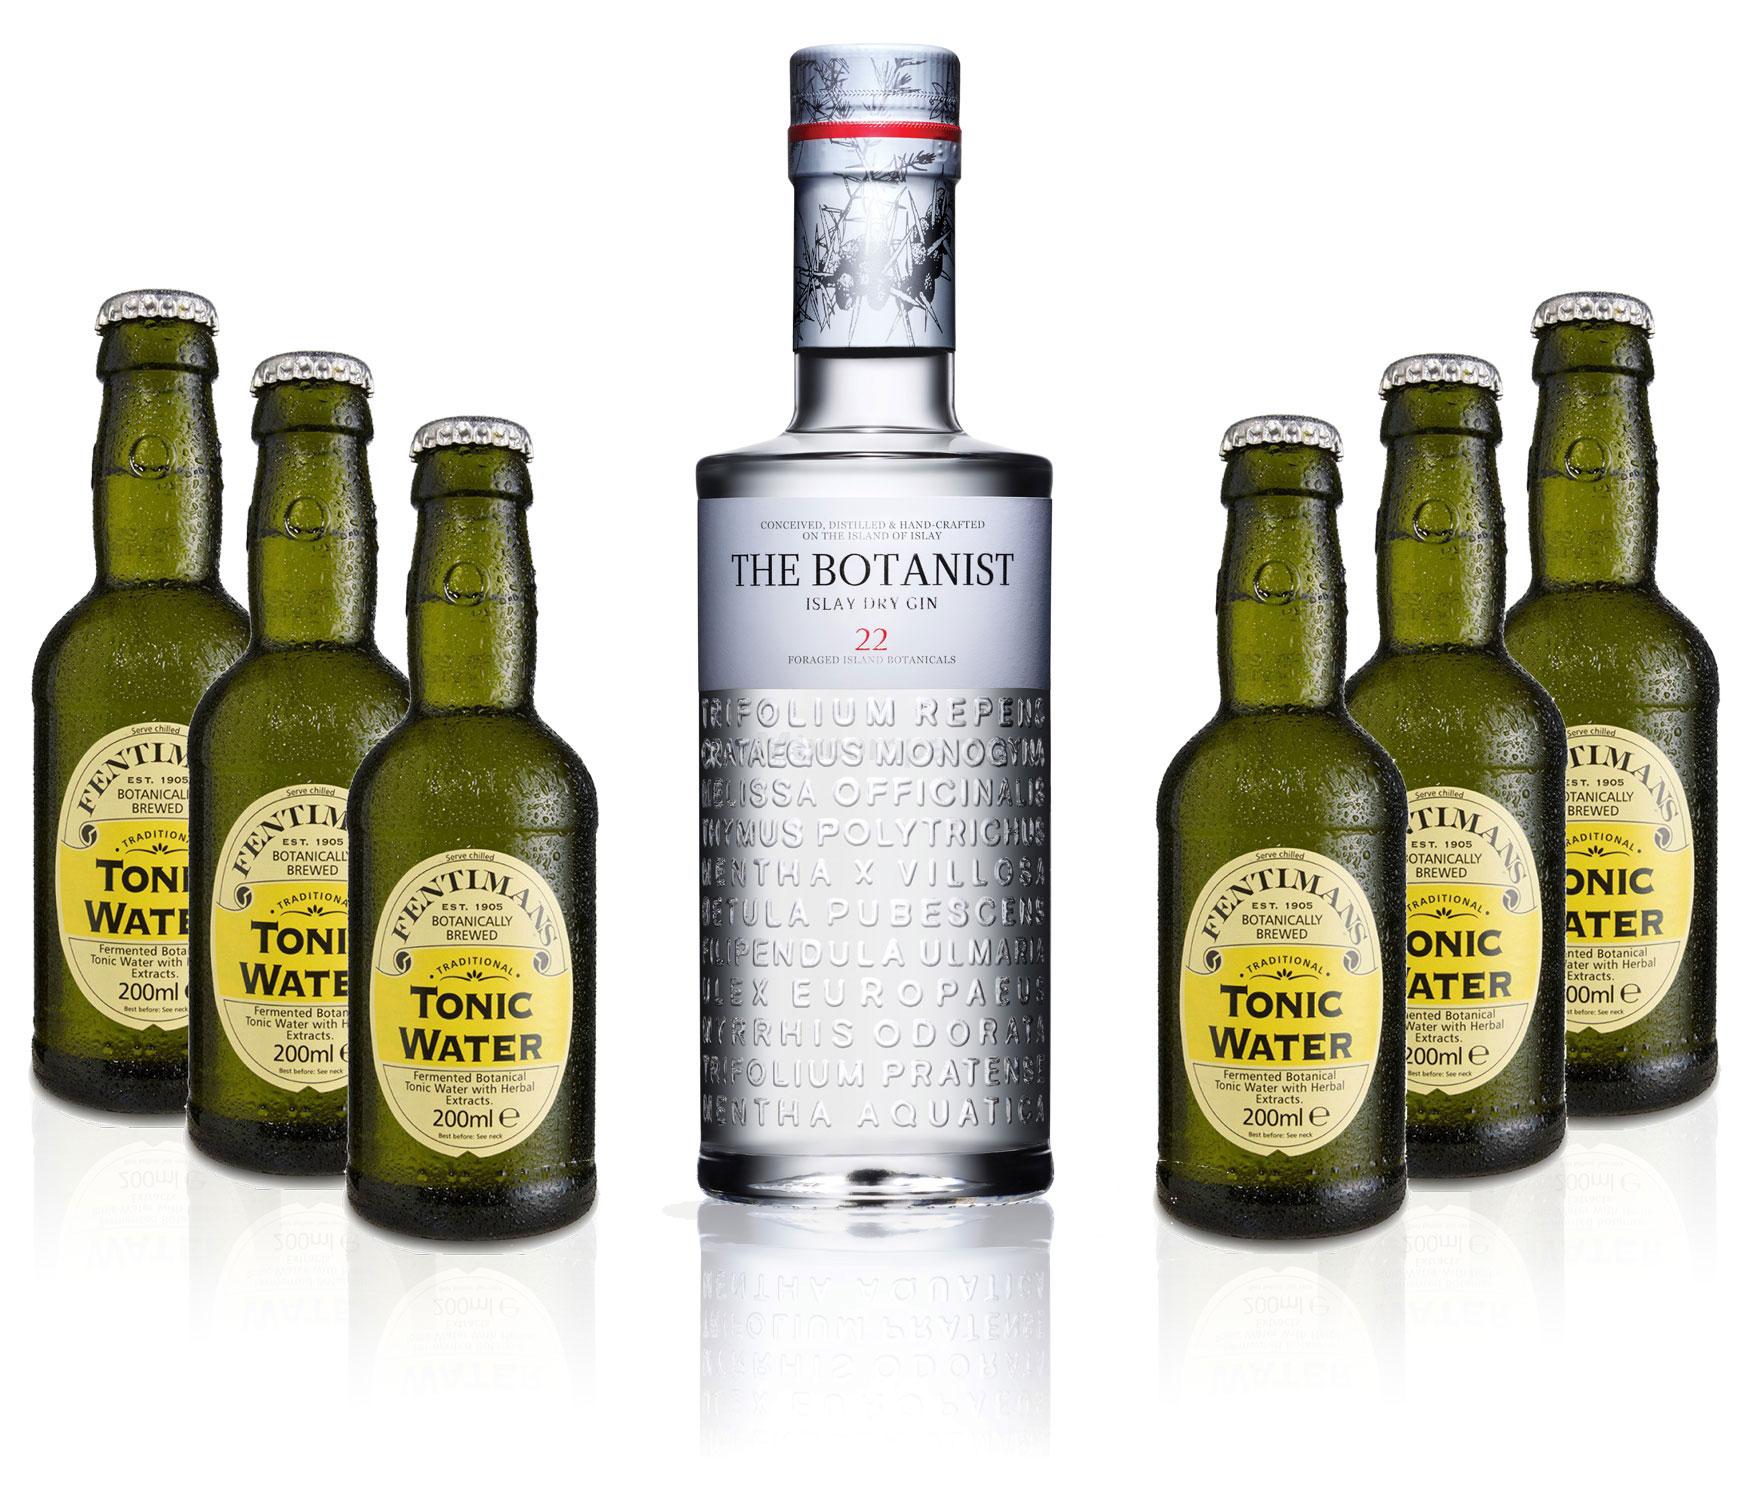 Gin Tonic Set - The Botanist Islay Dry Gin 0,7l 700ml (46% Vol) + 6x Fentimans Tonic Water 200ml inkl. Pfand MEHRWEG